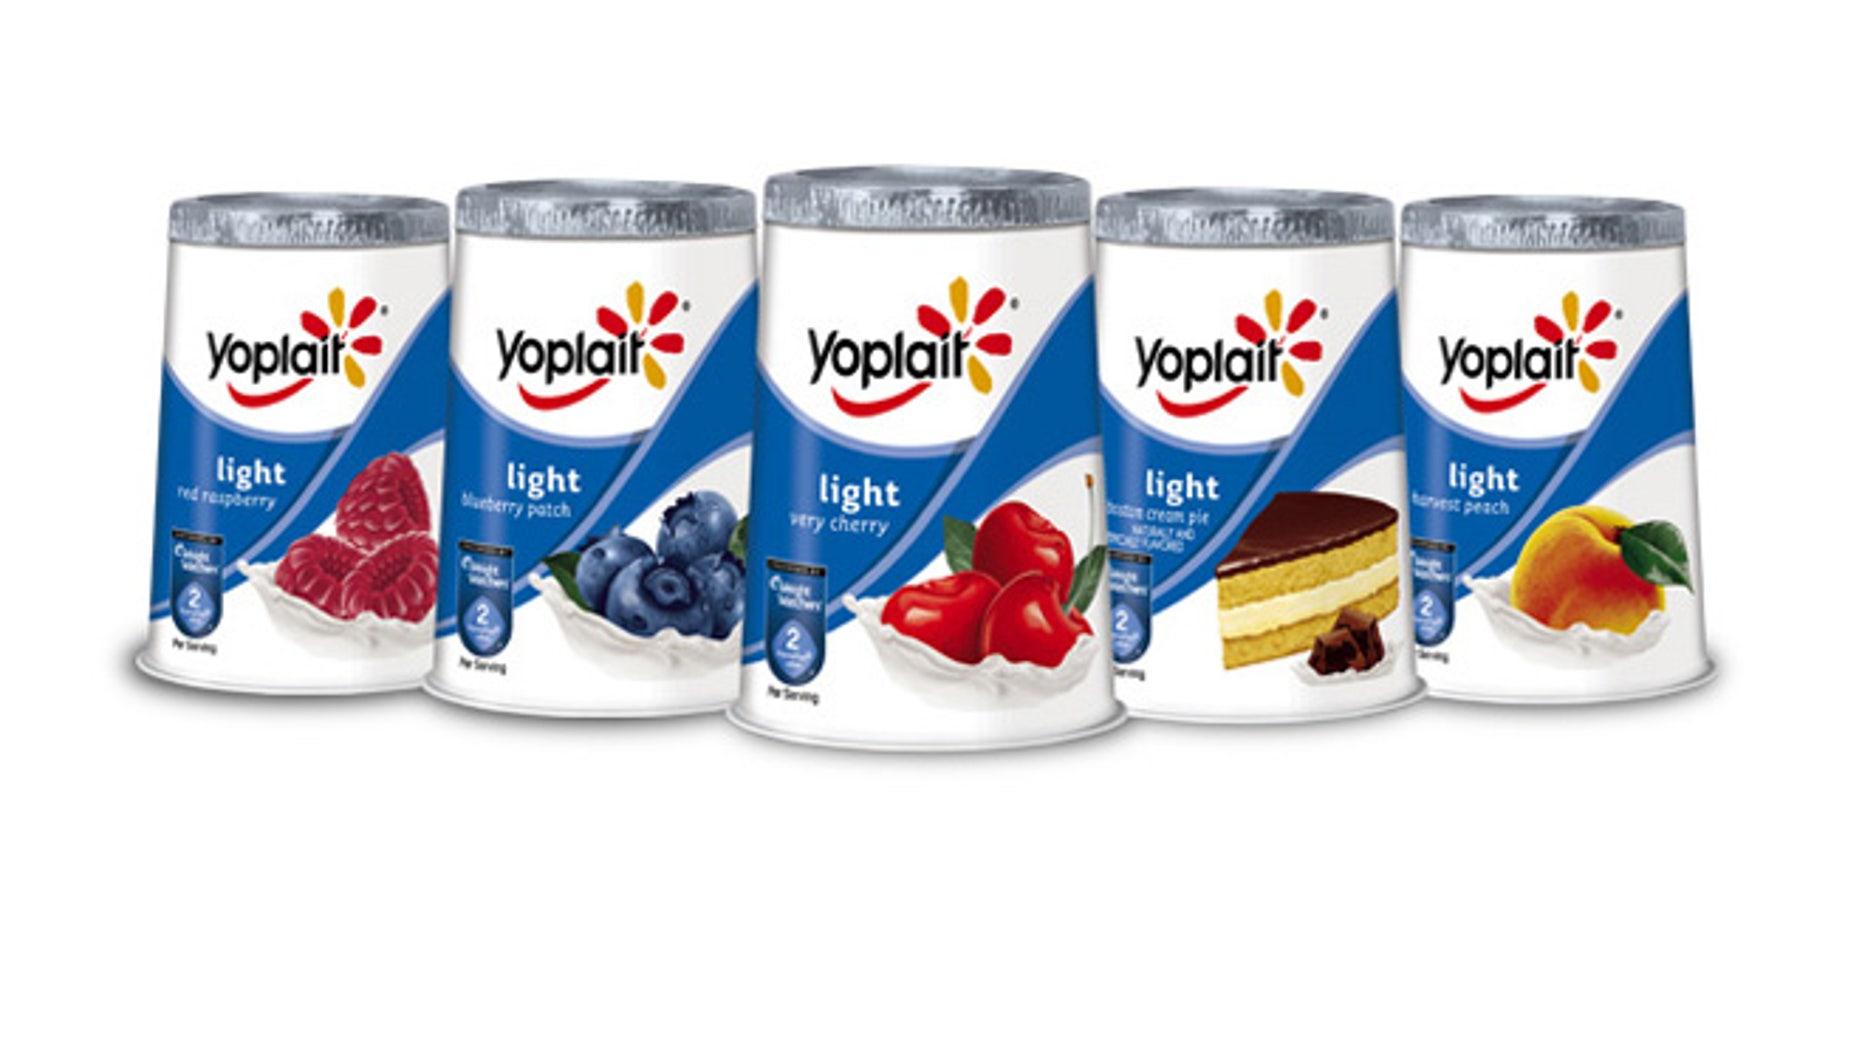 Yoplait Light changing artificial sweeteners